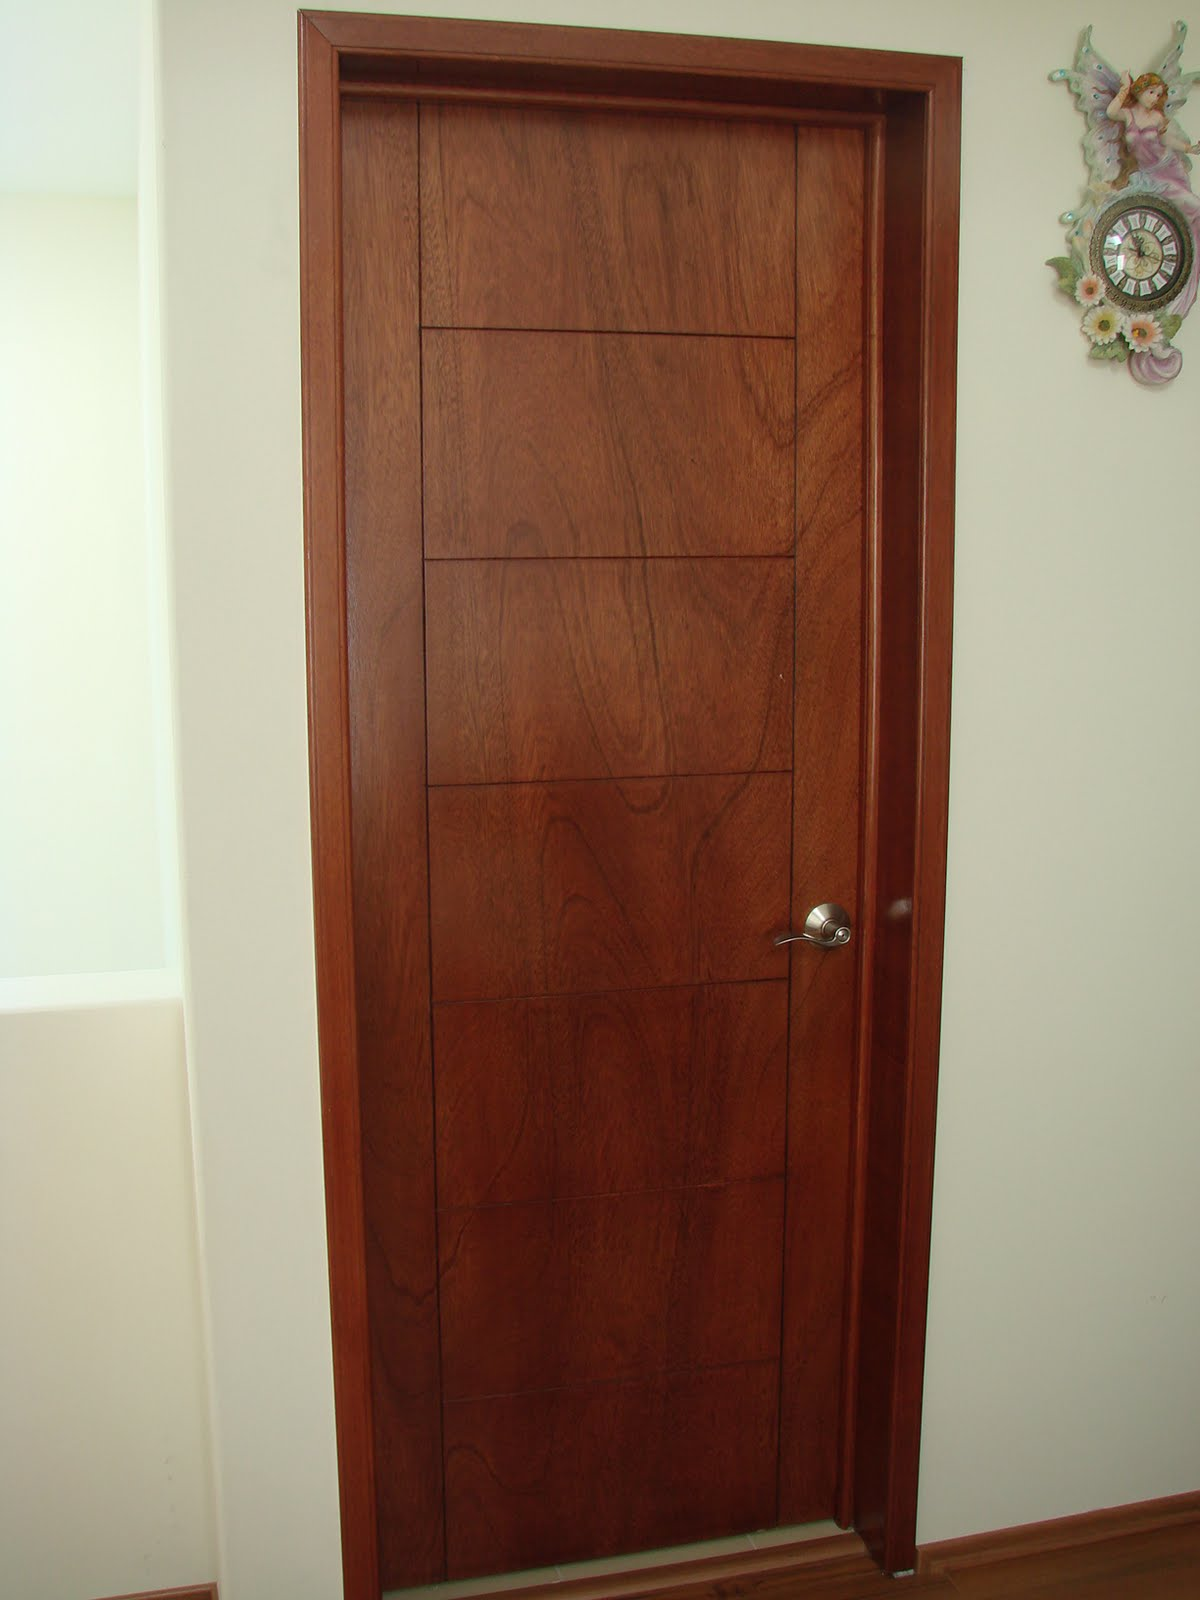 Puertas corredizas de tambor puerta en madera cedro macisa - Puerta corrediza madera ...